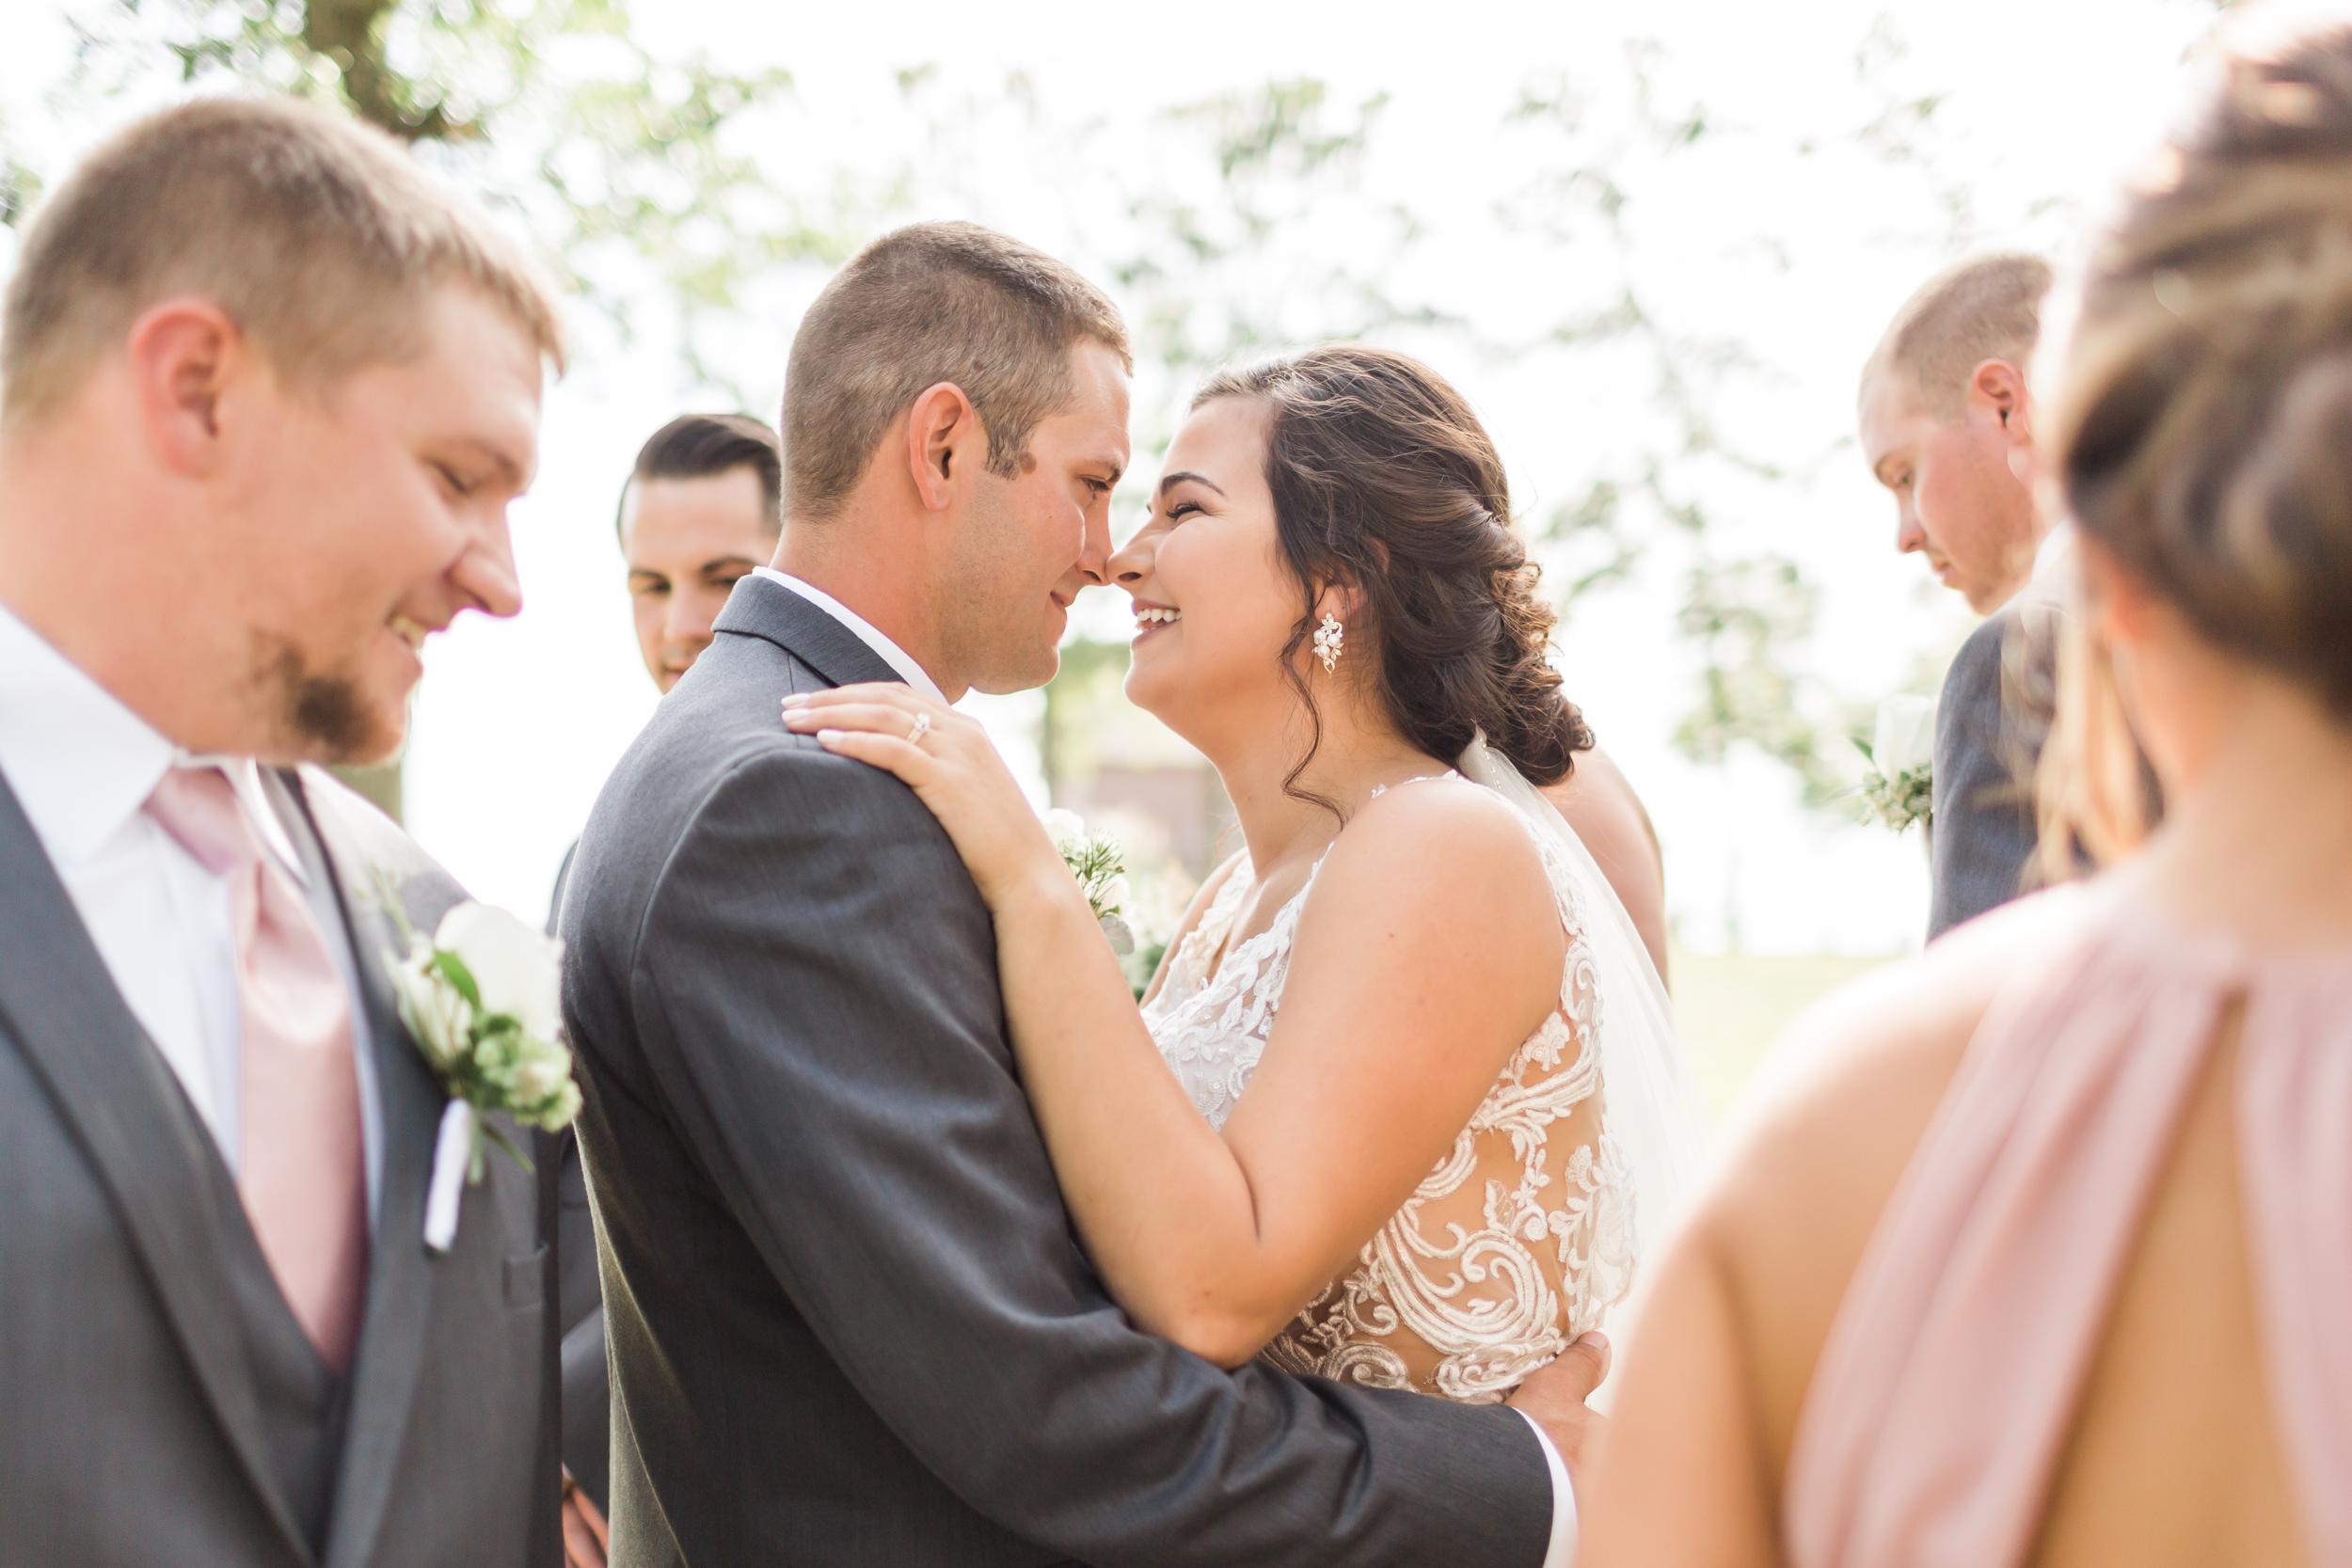 romanticcountrywedding--47.jpg